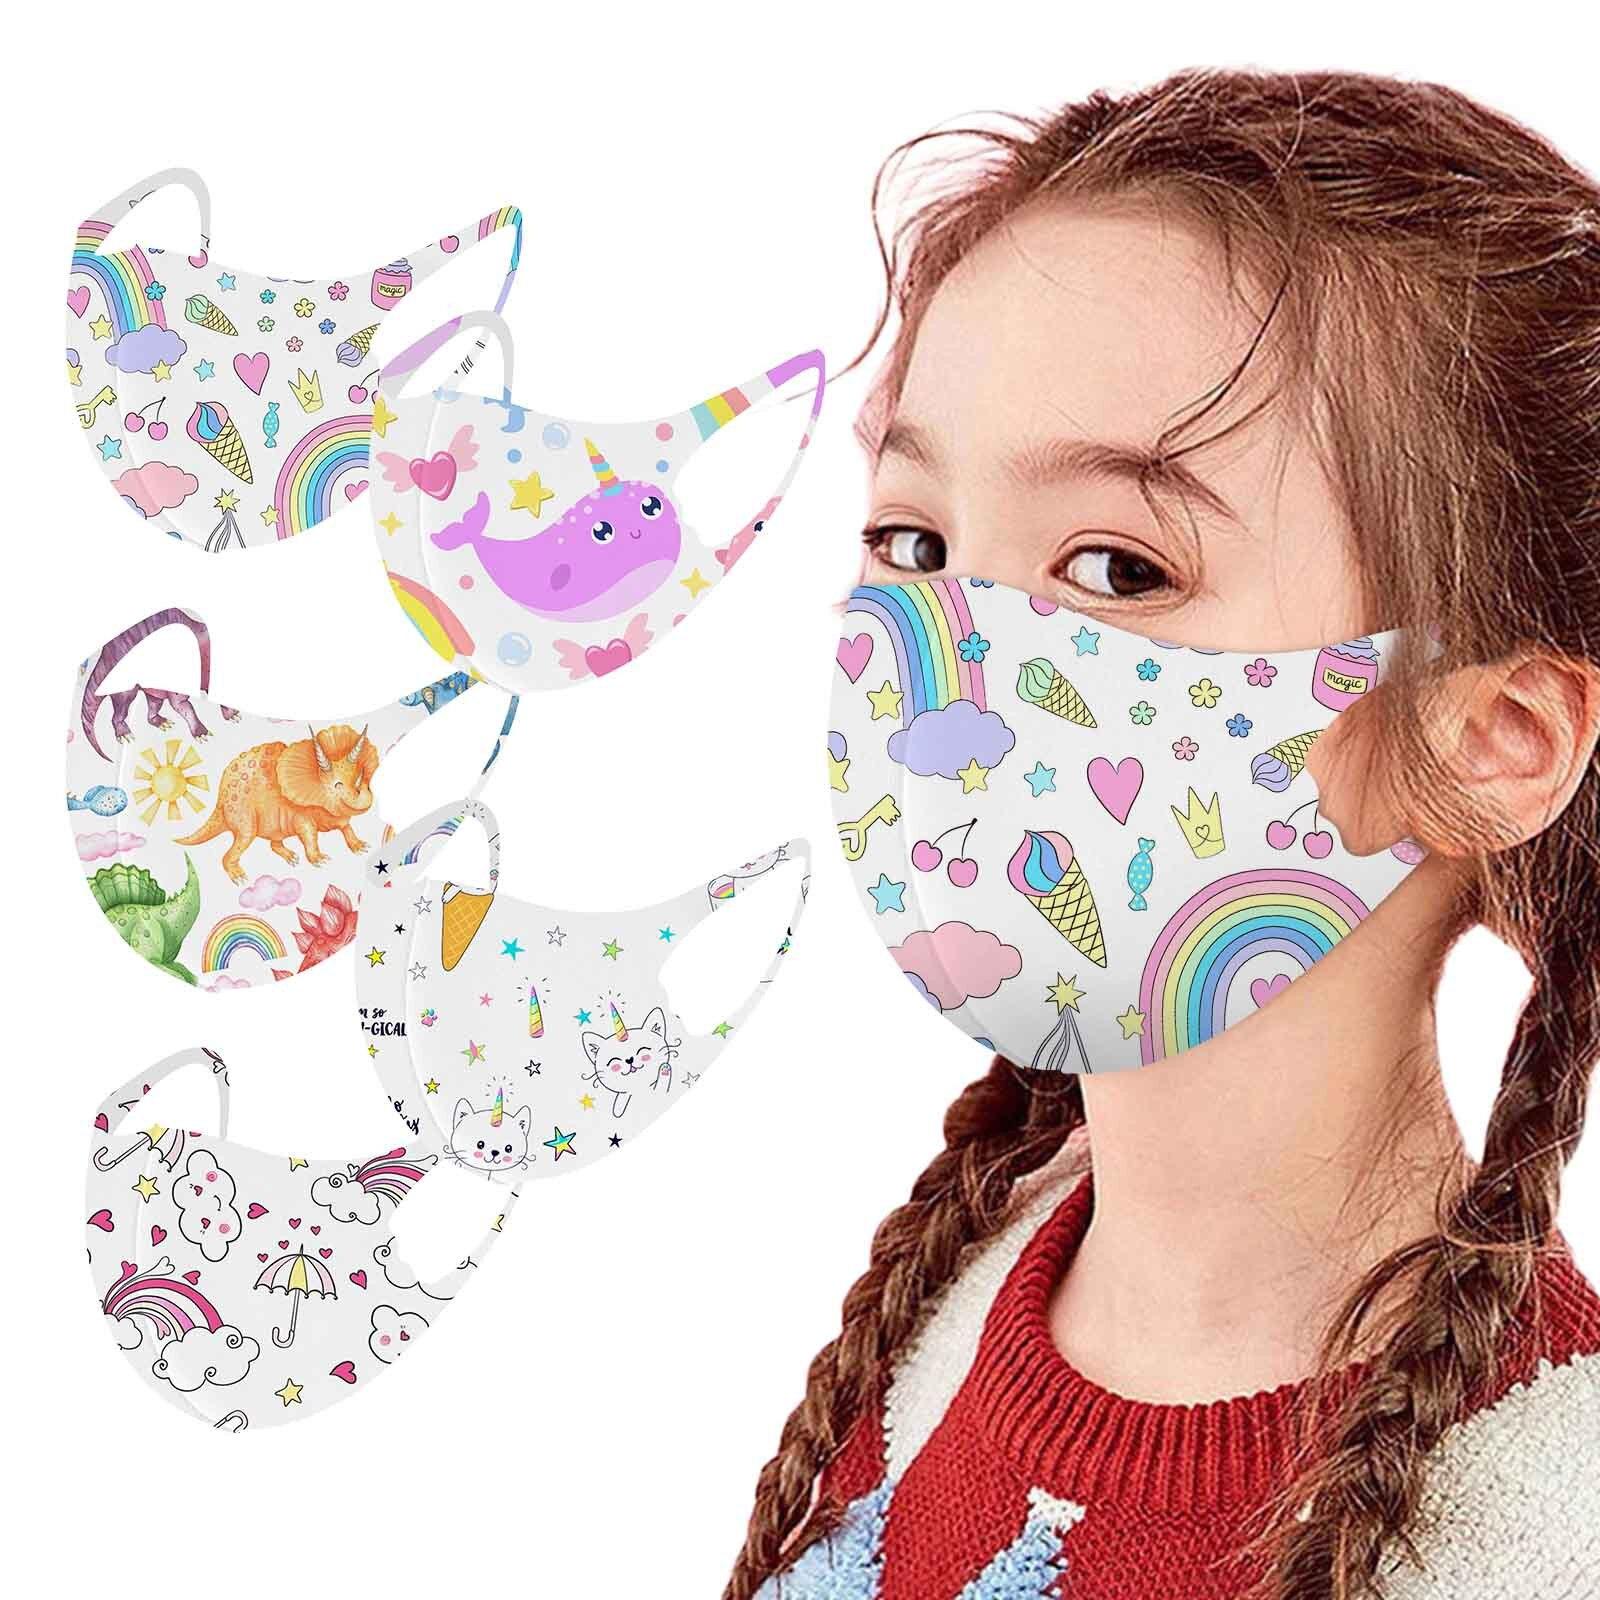 Headband mascarillas ni?os reutilizables kids masques Rainbow printed ice silk cloth mask for childr